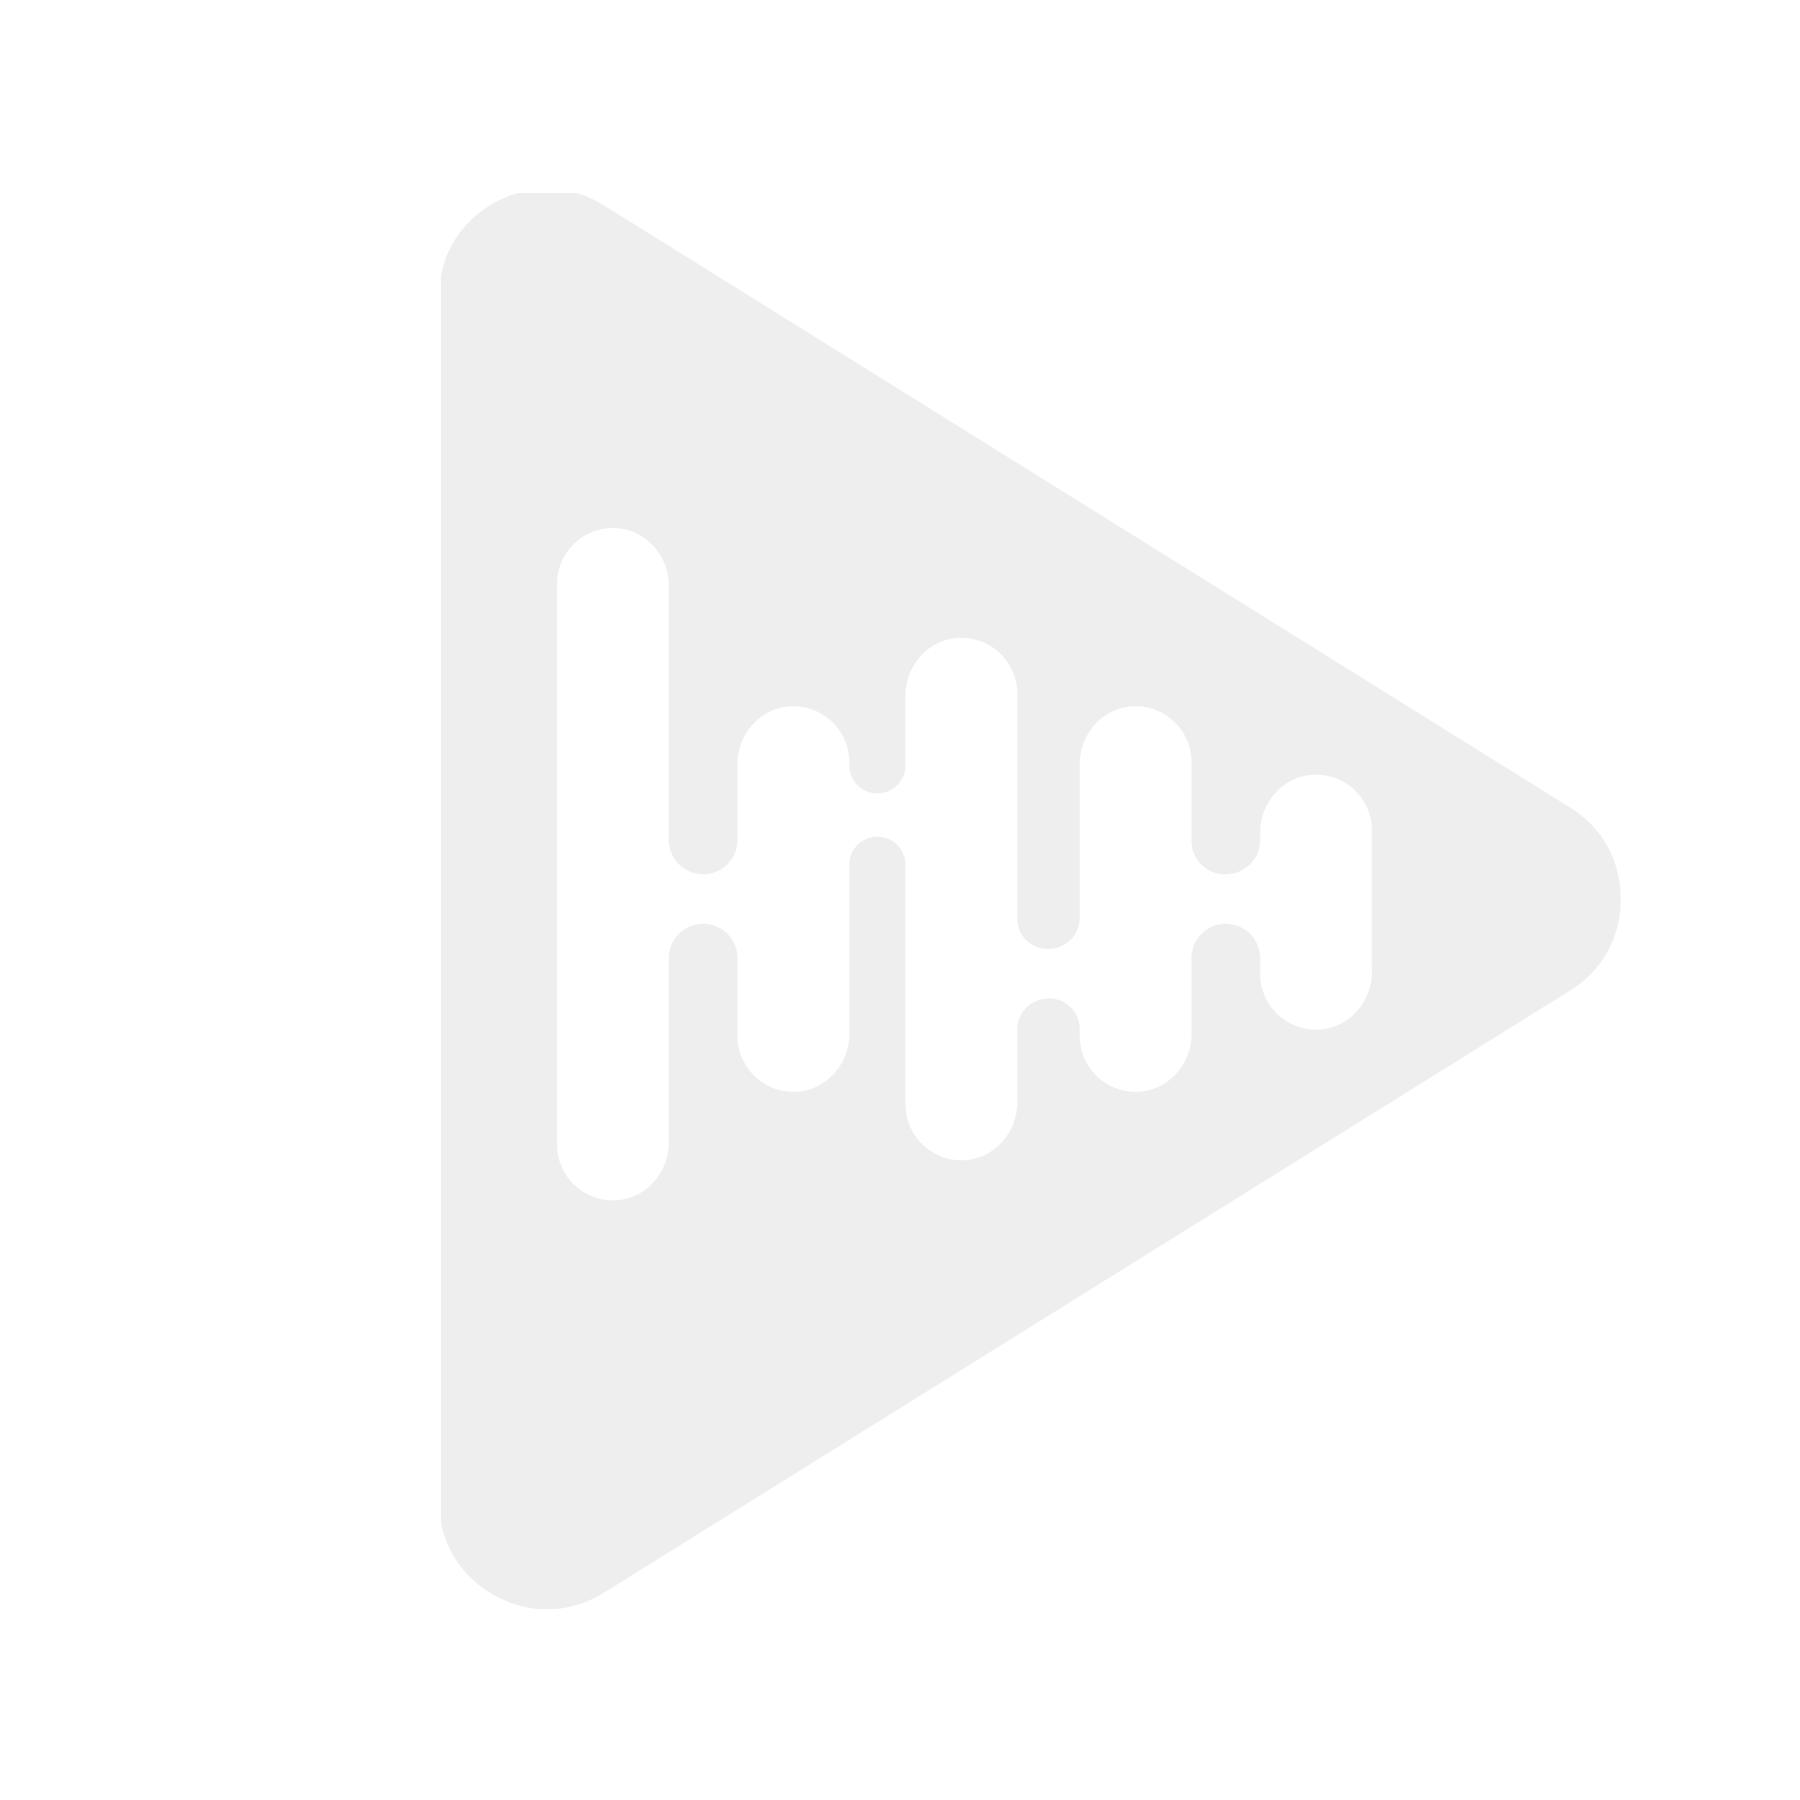 Oehlbach MMT VIDEO - PRO IN analog video-innsats/singel RCA